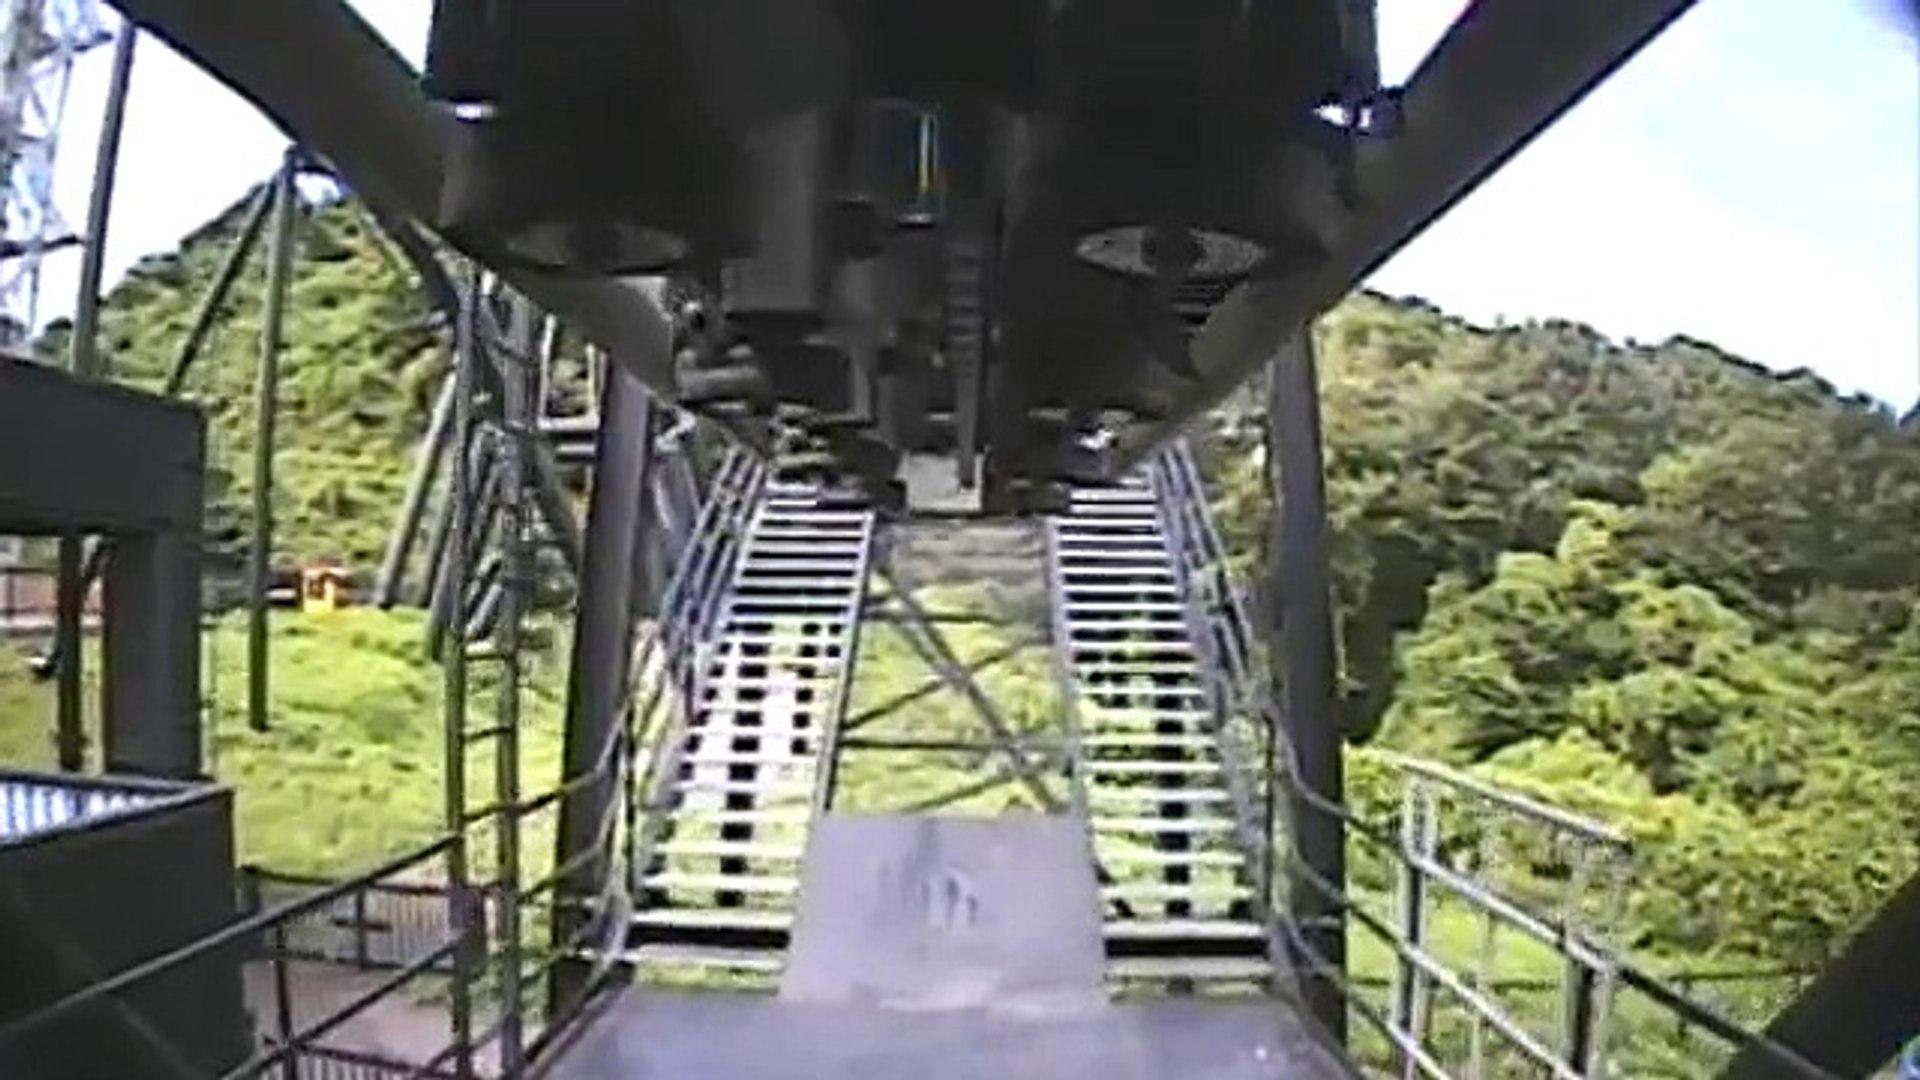 Diavlo Japanese Batman B&M Inverted Roller Coaster Front Seat POV Onride Central Park Japan